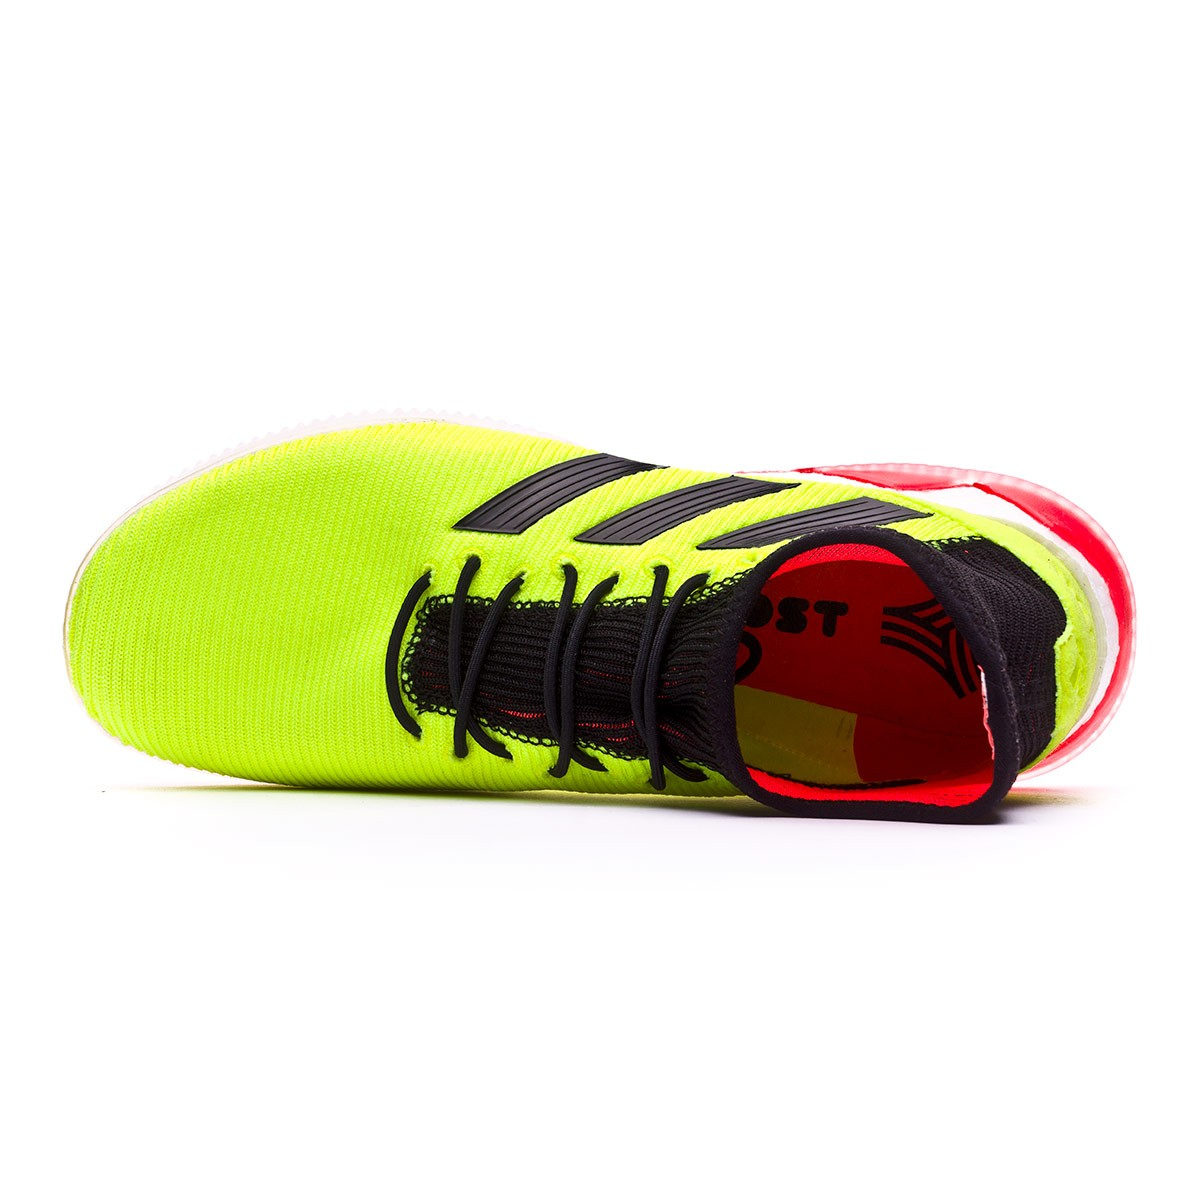 ... Zapatilla Predator Tango 18.1 TR Solar yellow-Black-Solar red. CATEGORY b180754929f03